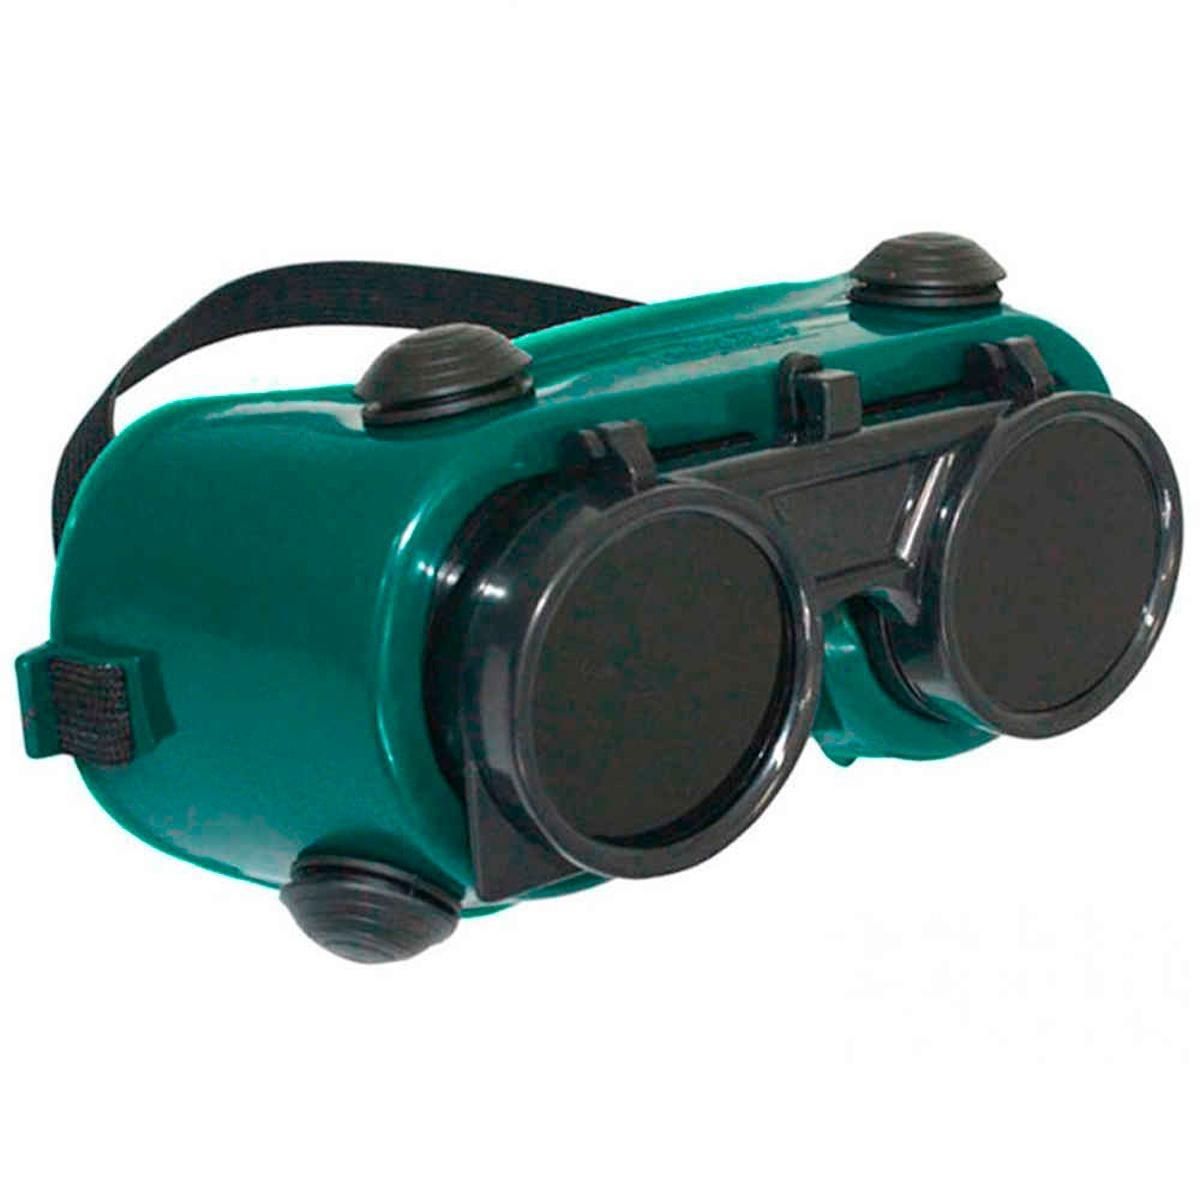 ac9afad158f39 óculos de solda cg250 carbografite redondo, visor articulado. Carregando  zoom.